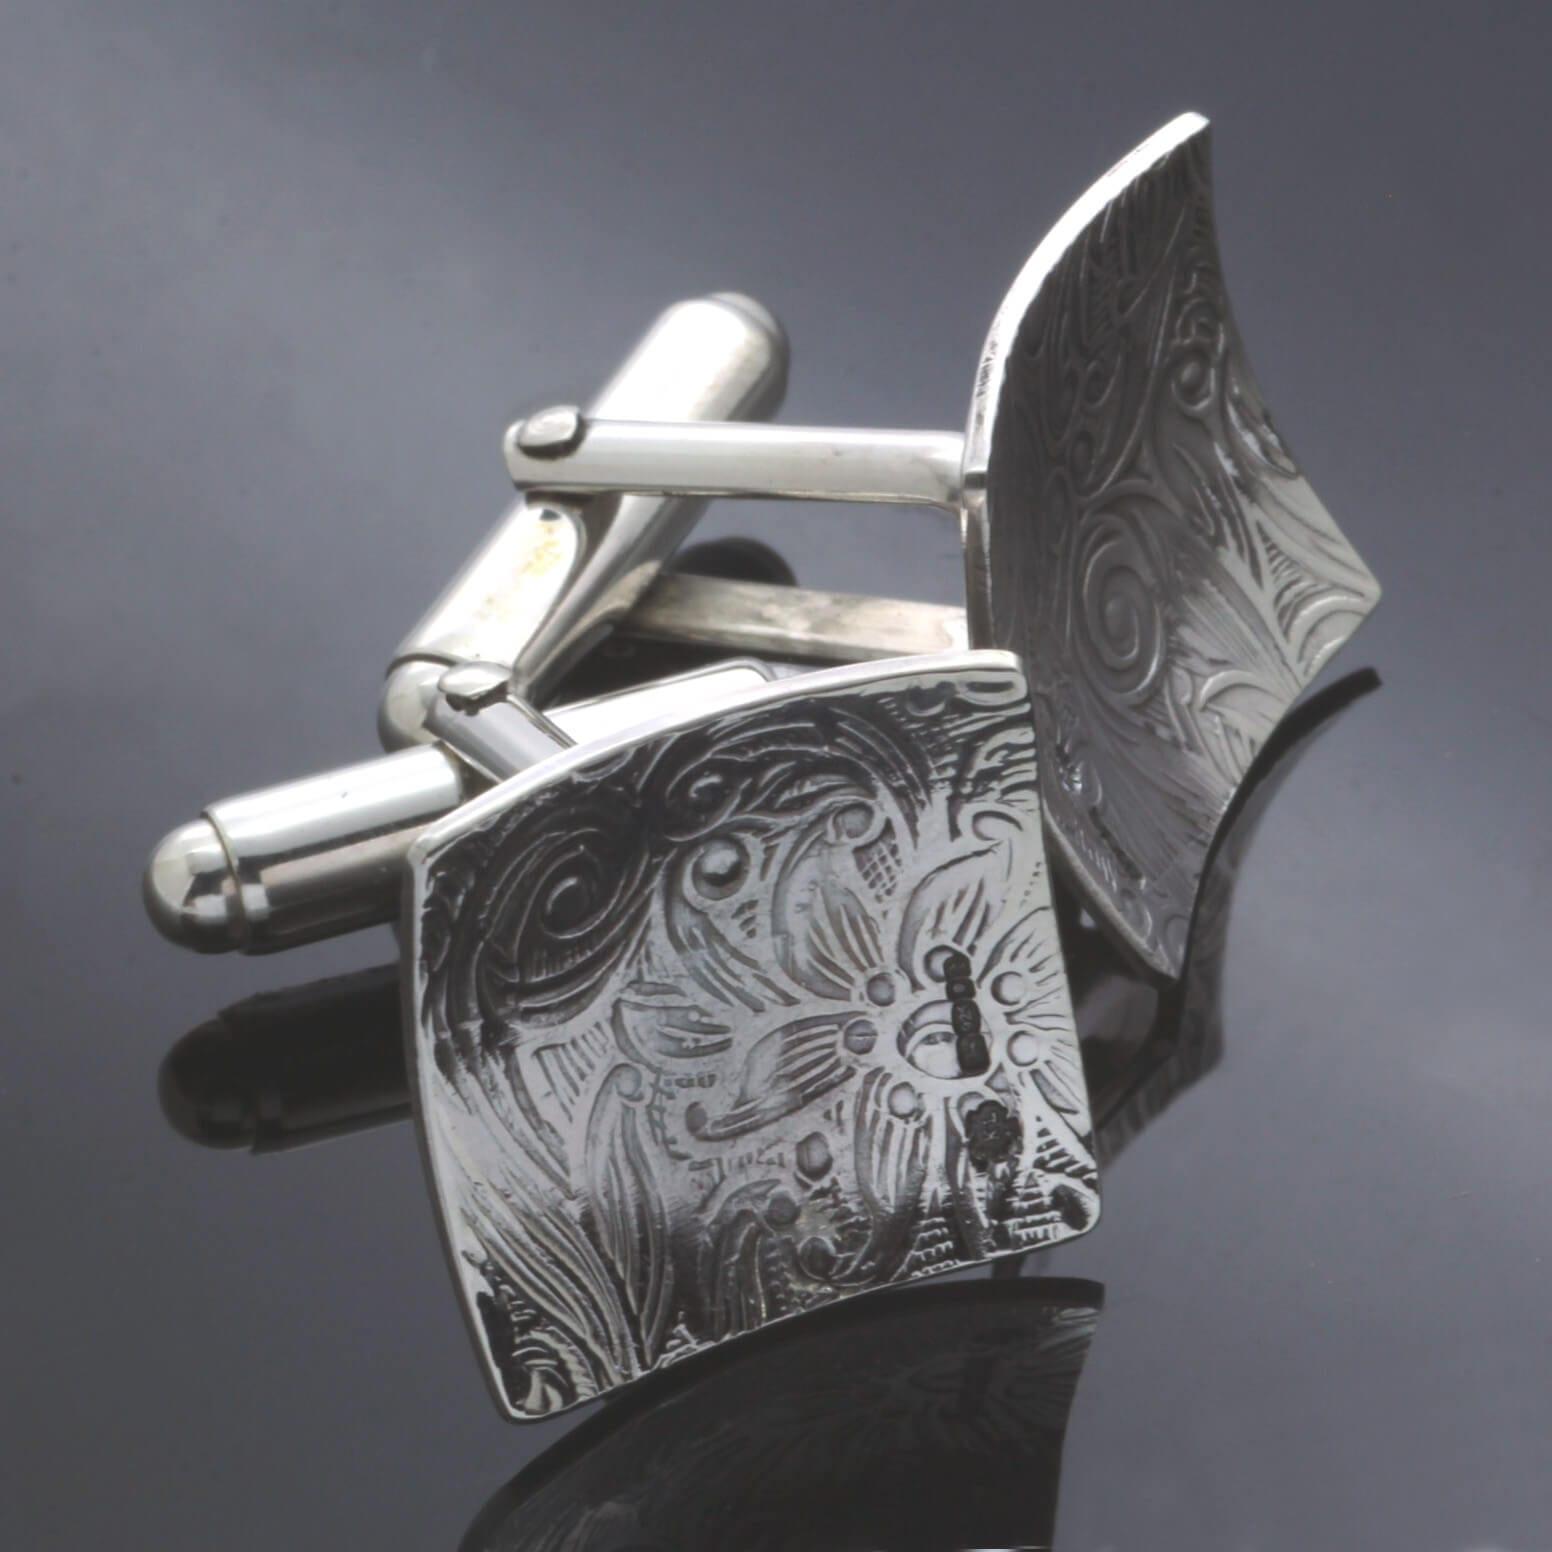 Handmade textured Sterling Silver cufflinks